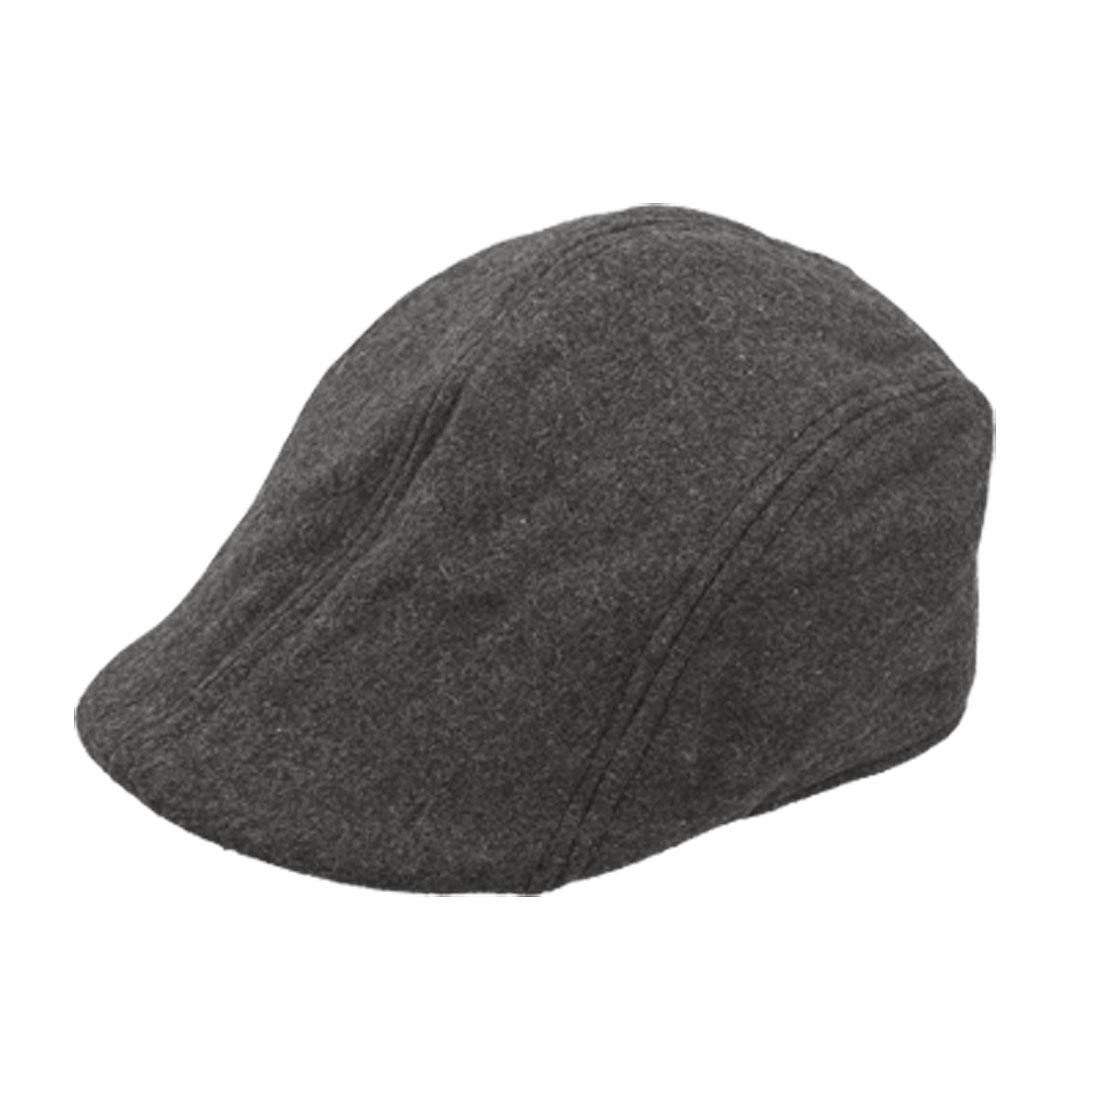 Ladies Dark Gray Worsted Solid Visor Ascot Cap Spring Hat